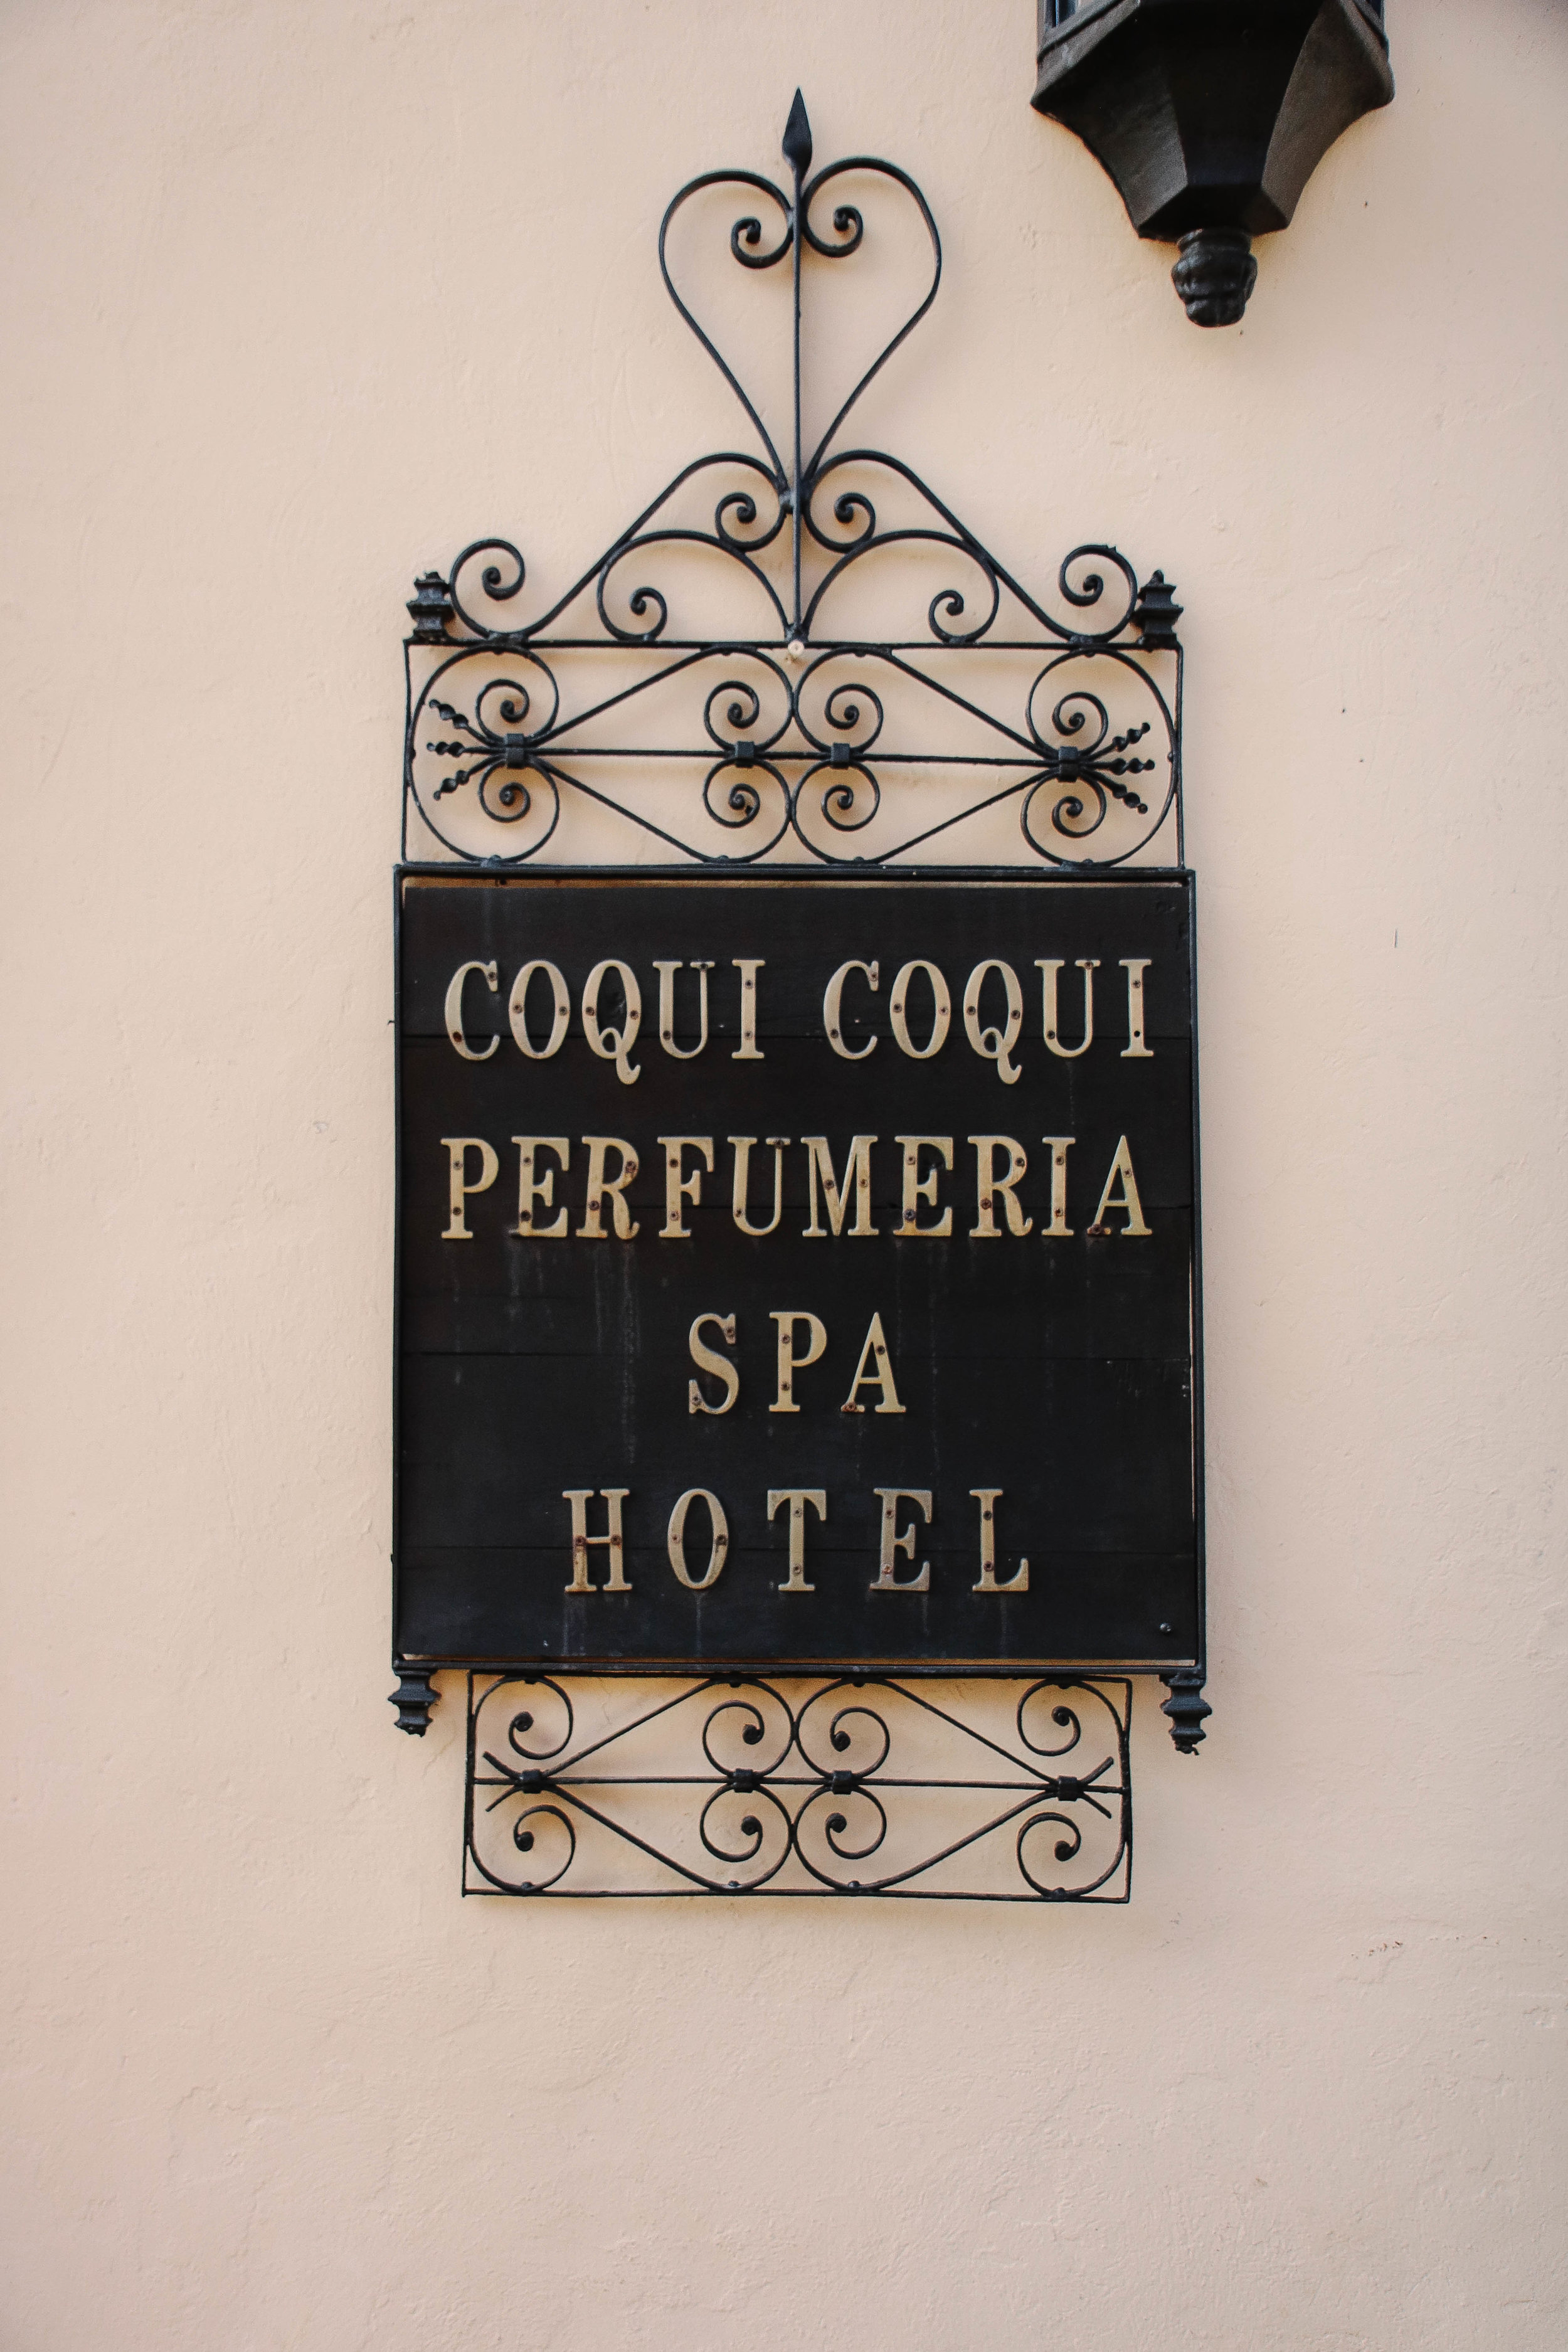 Coqui Coqui  Perfumeria   Spa   Hotel